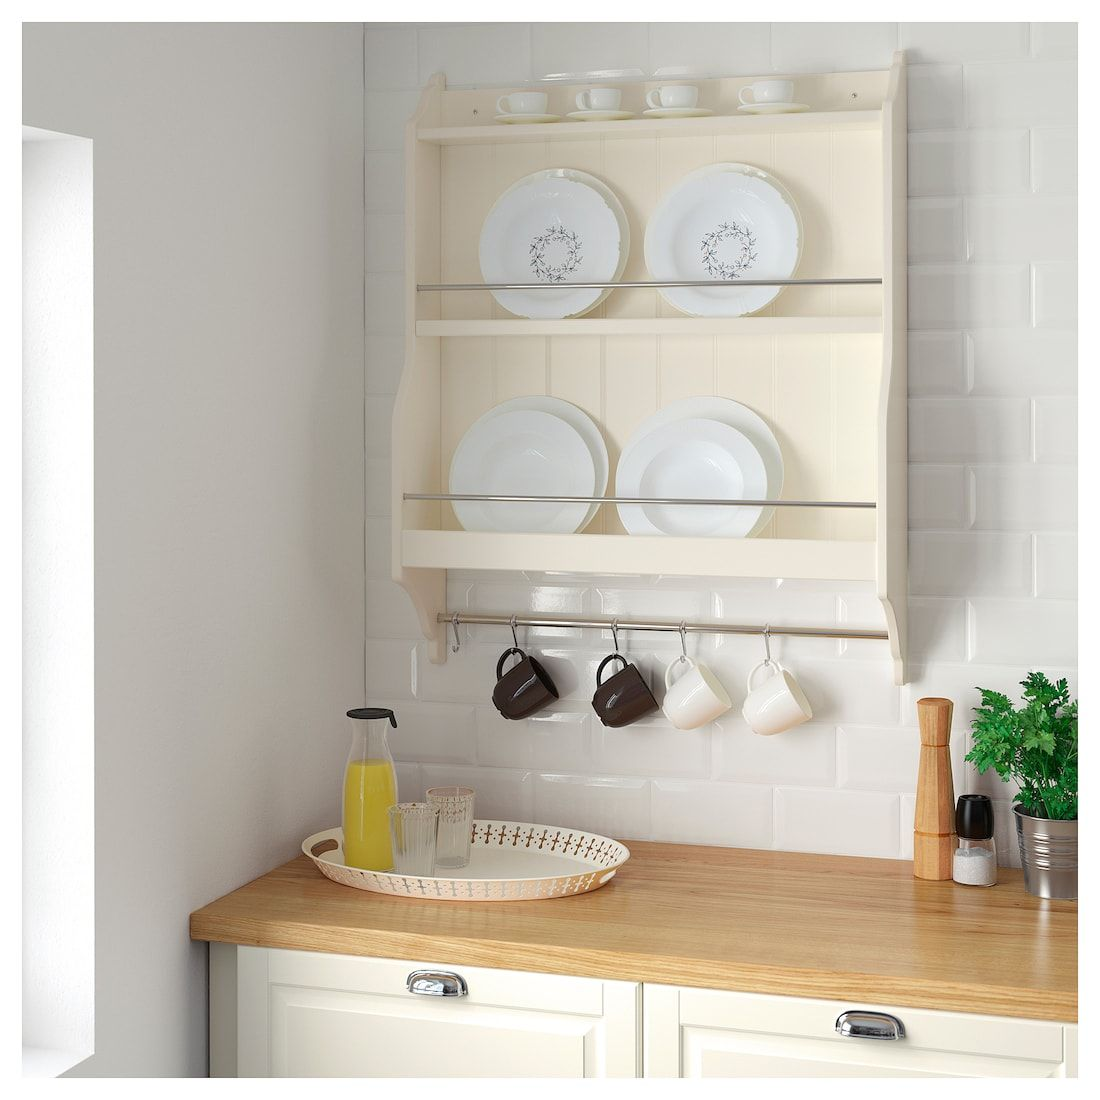 Tornviken Plate Shelf Off White Ikea Plate Shelves Kitchen Wall Storage Shelves